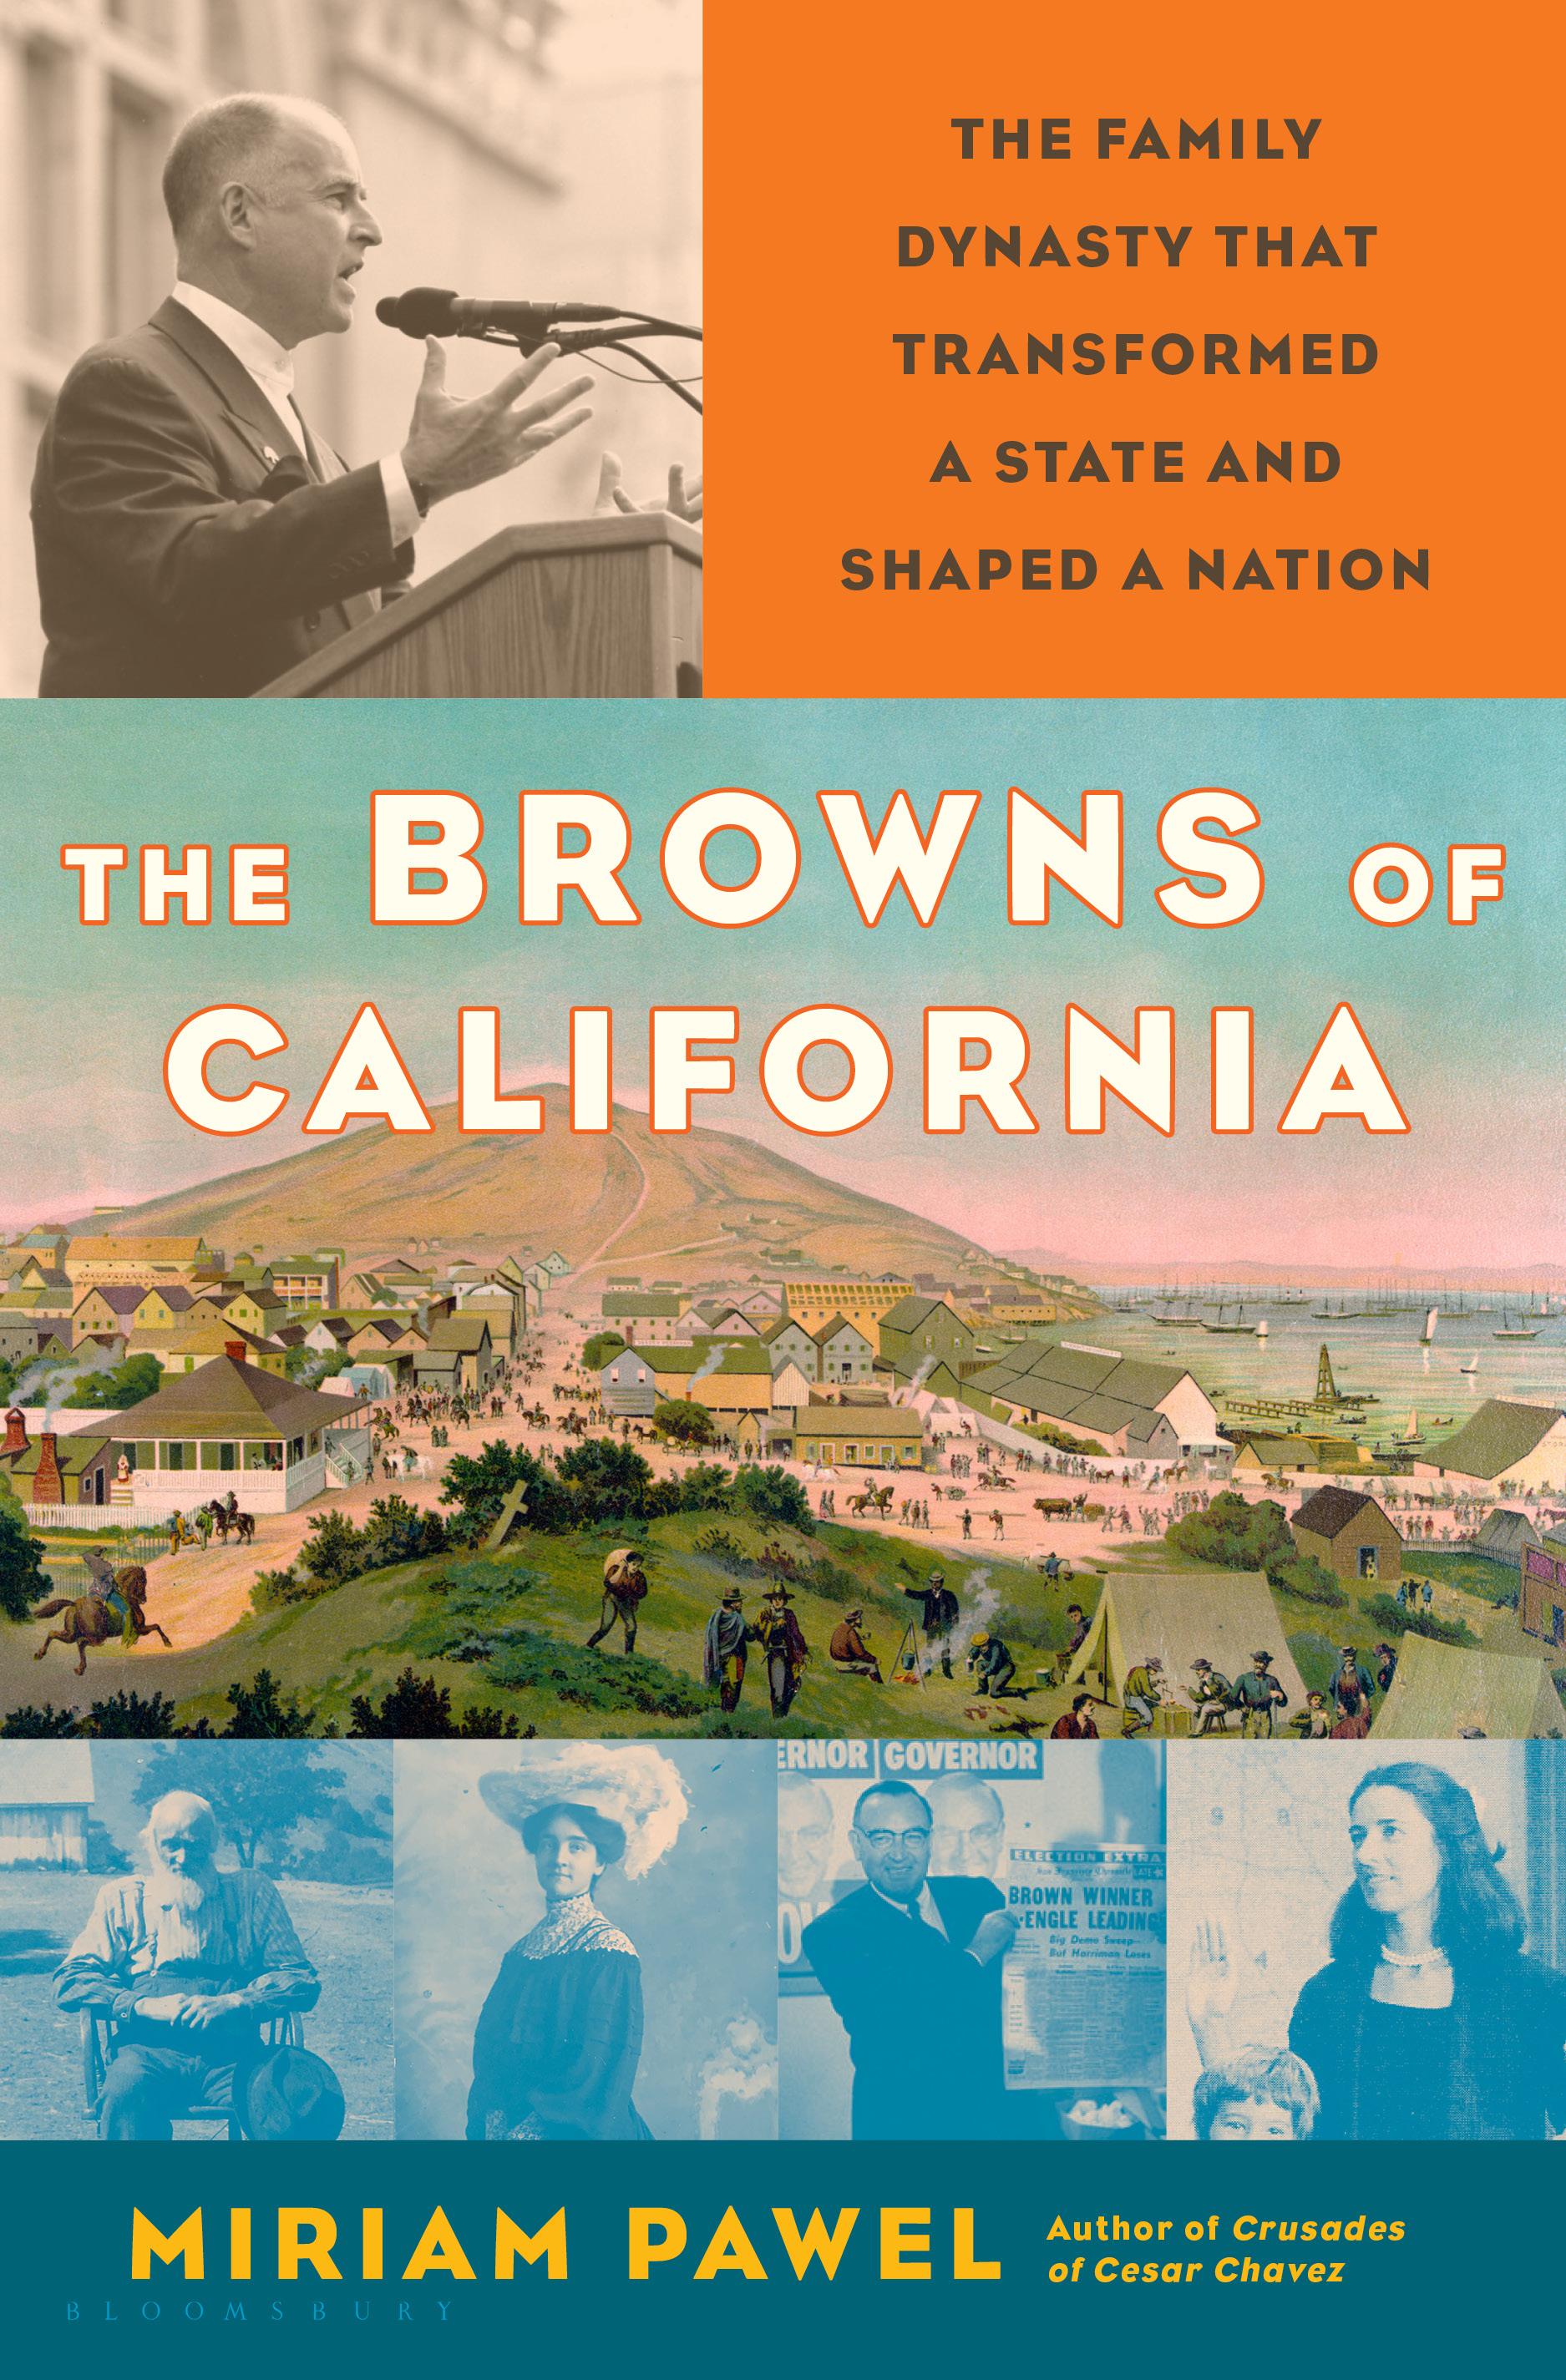 The Browns of California_HC_cat (002).jpg